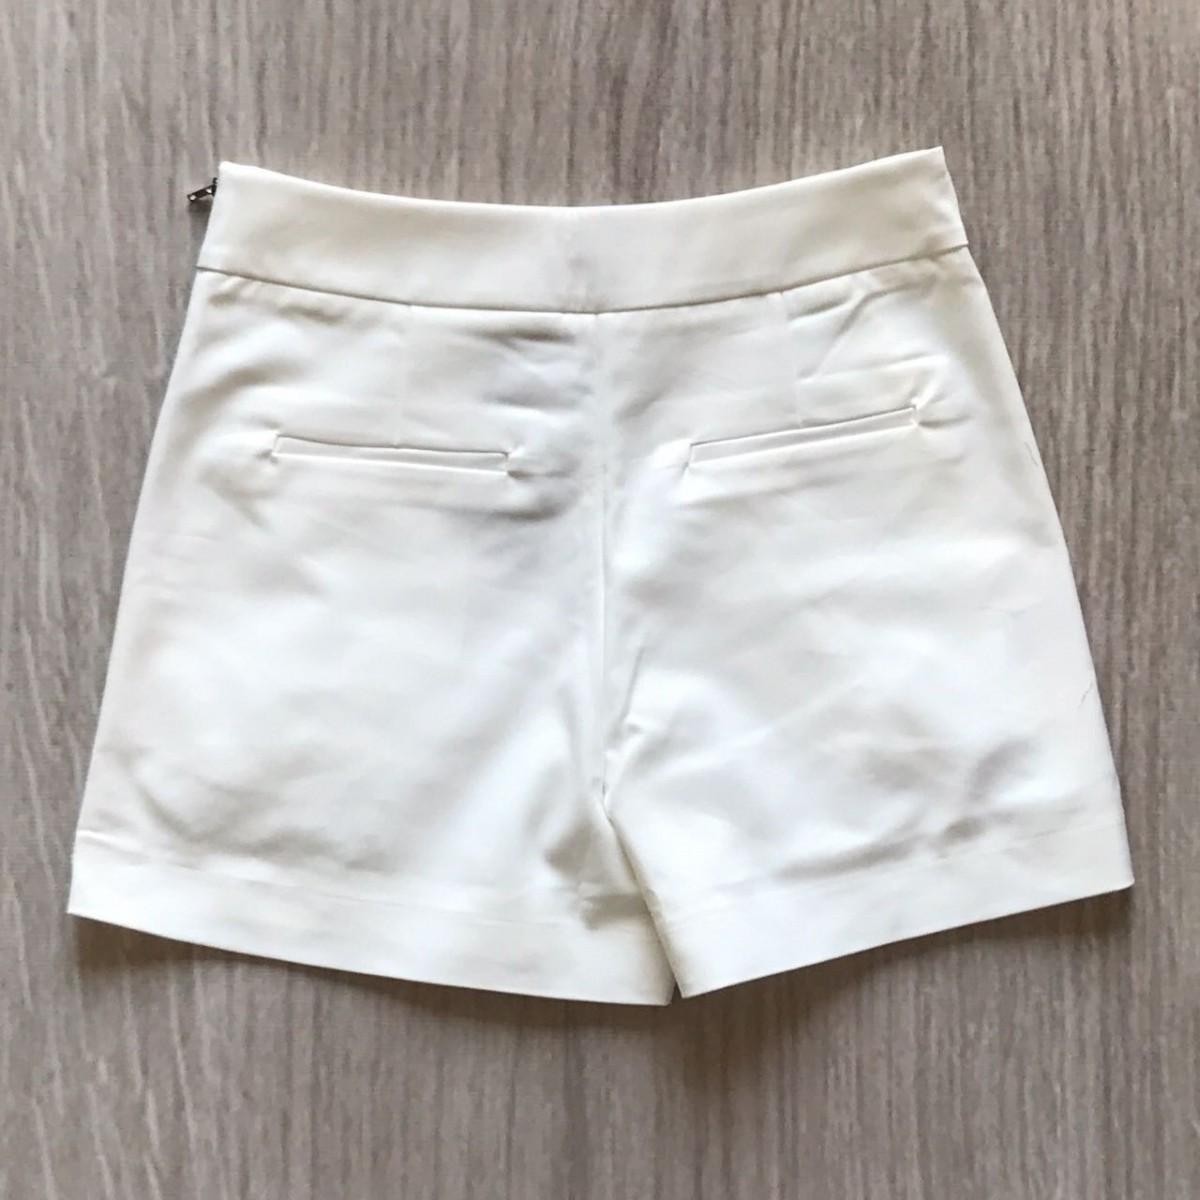 Shorts Offwhite Bordado